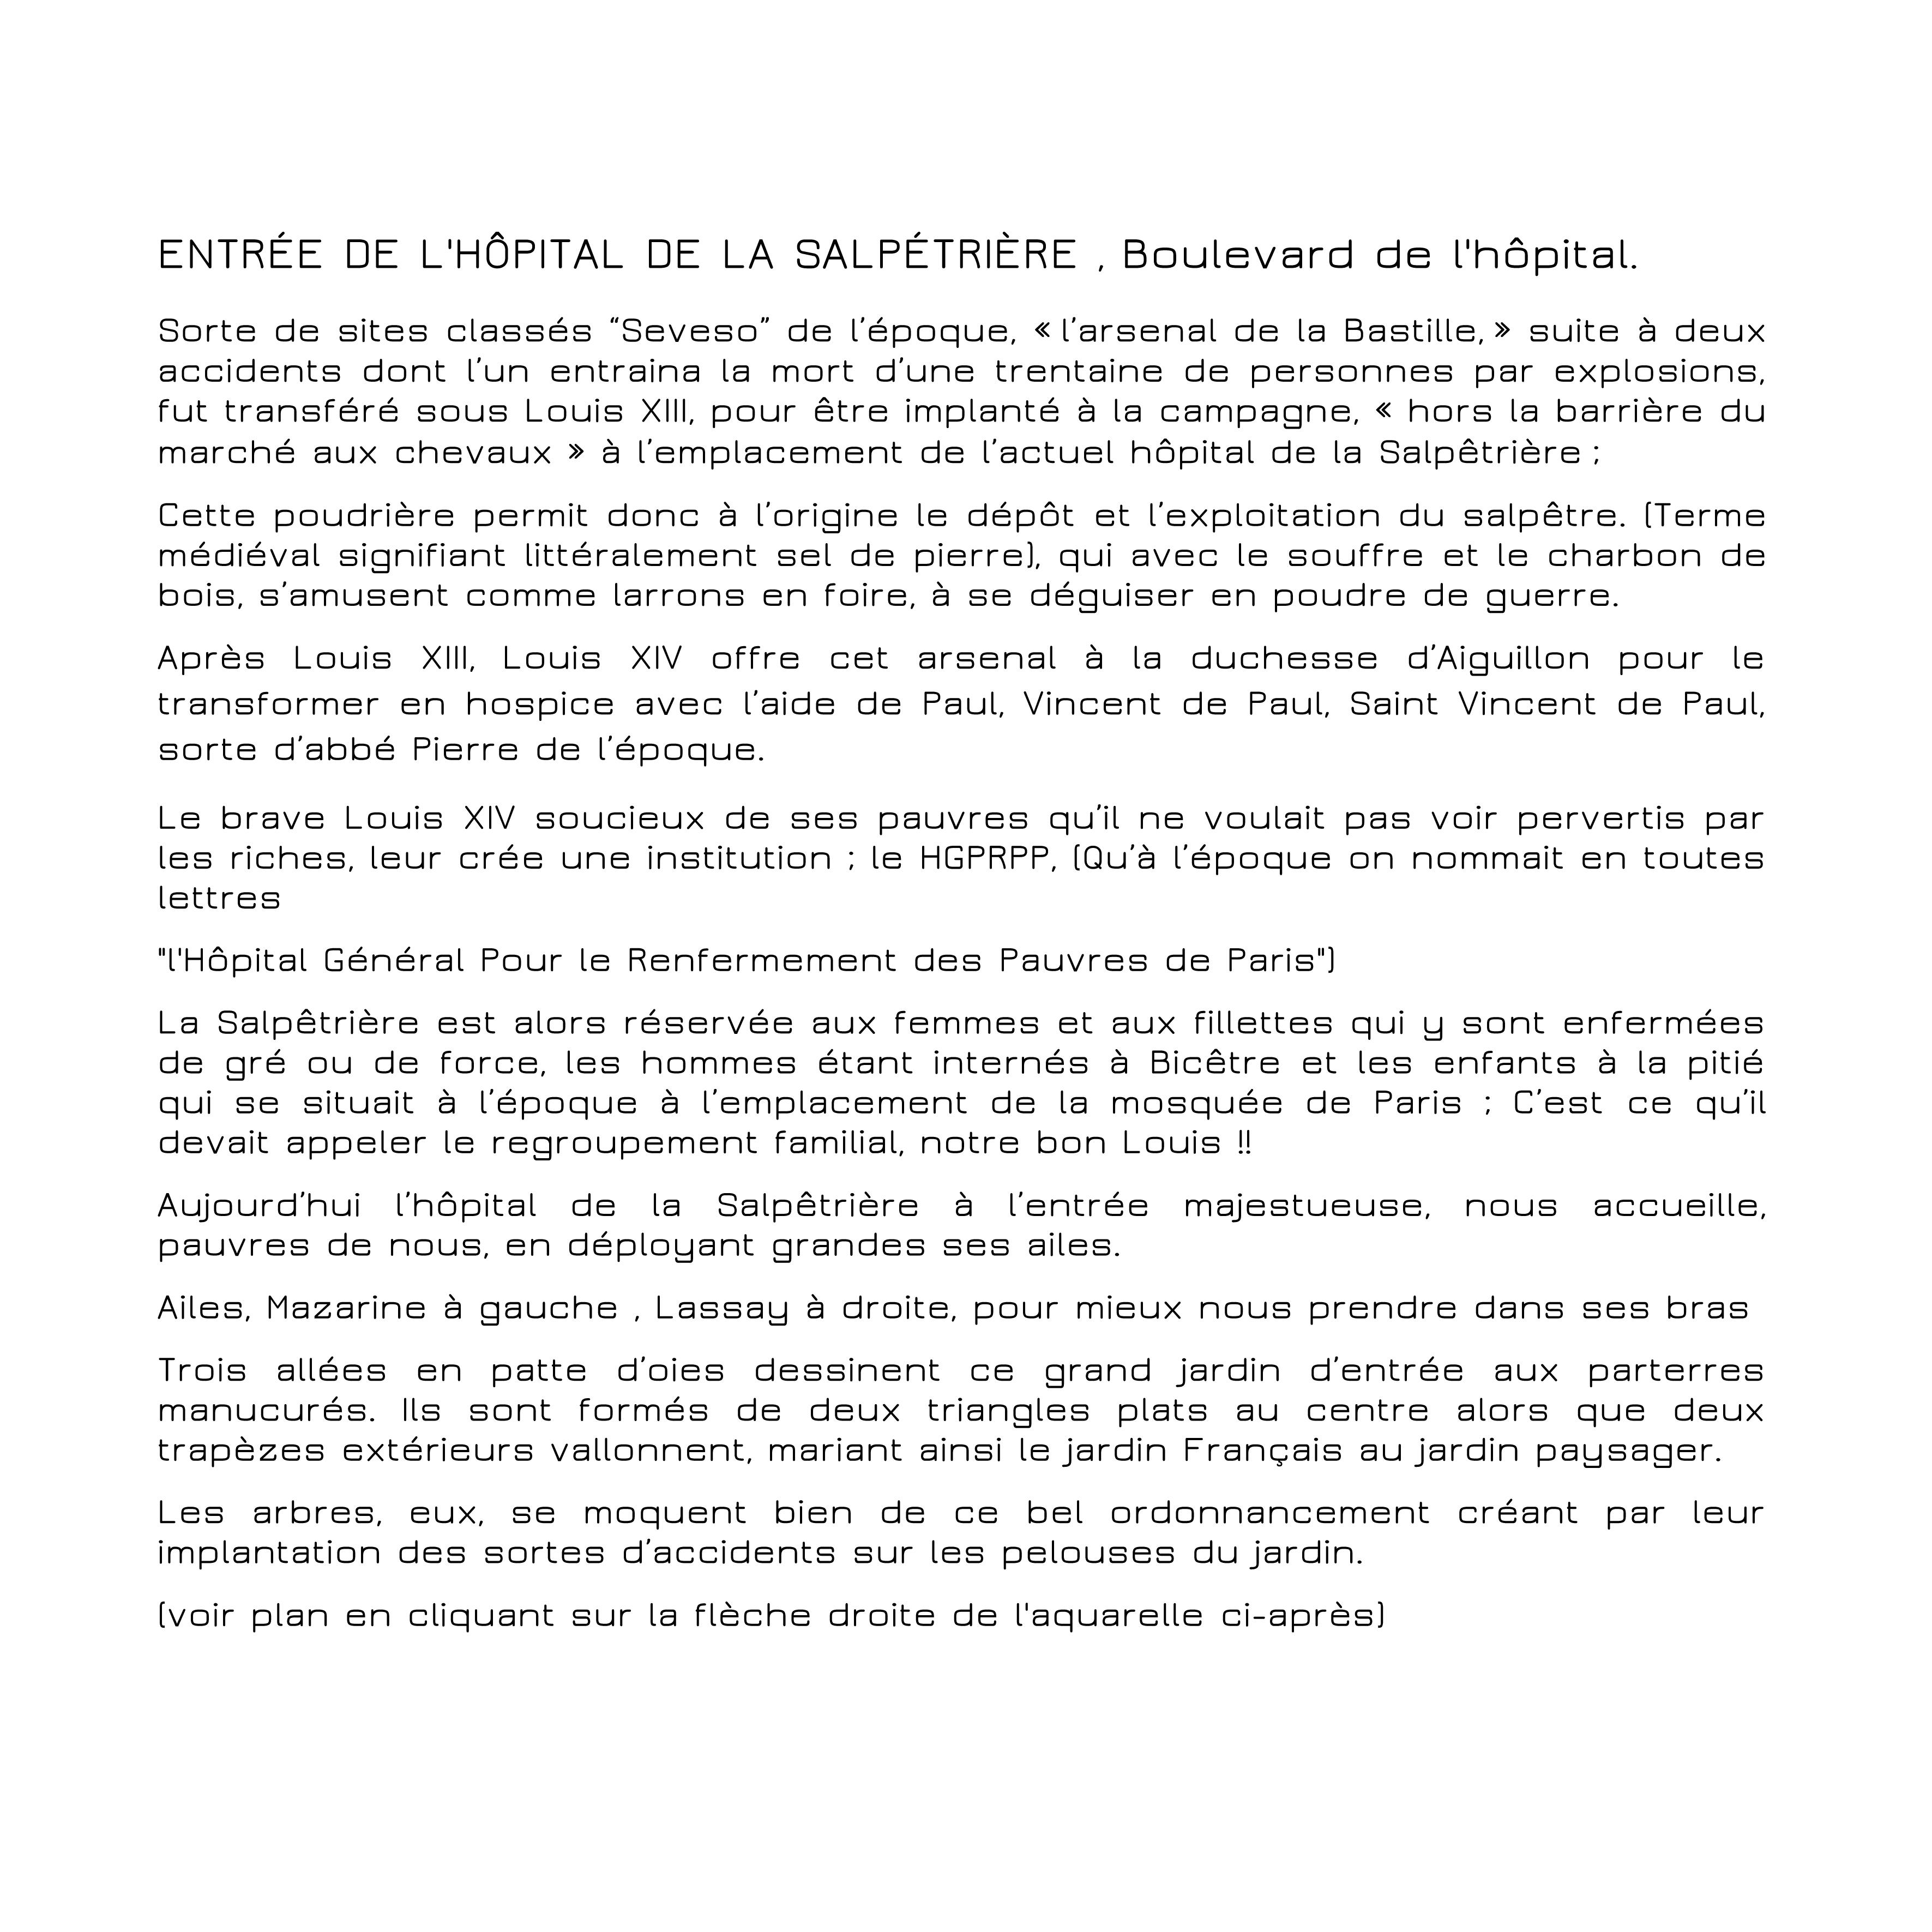 ENTREE DE LA SALPETRIÈRE